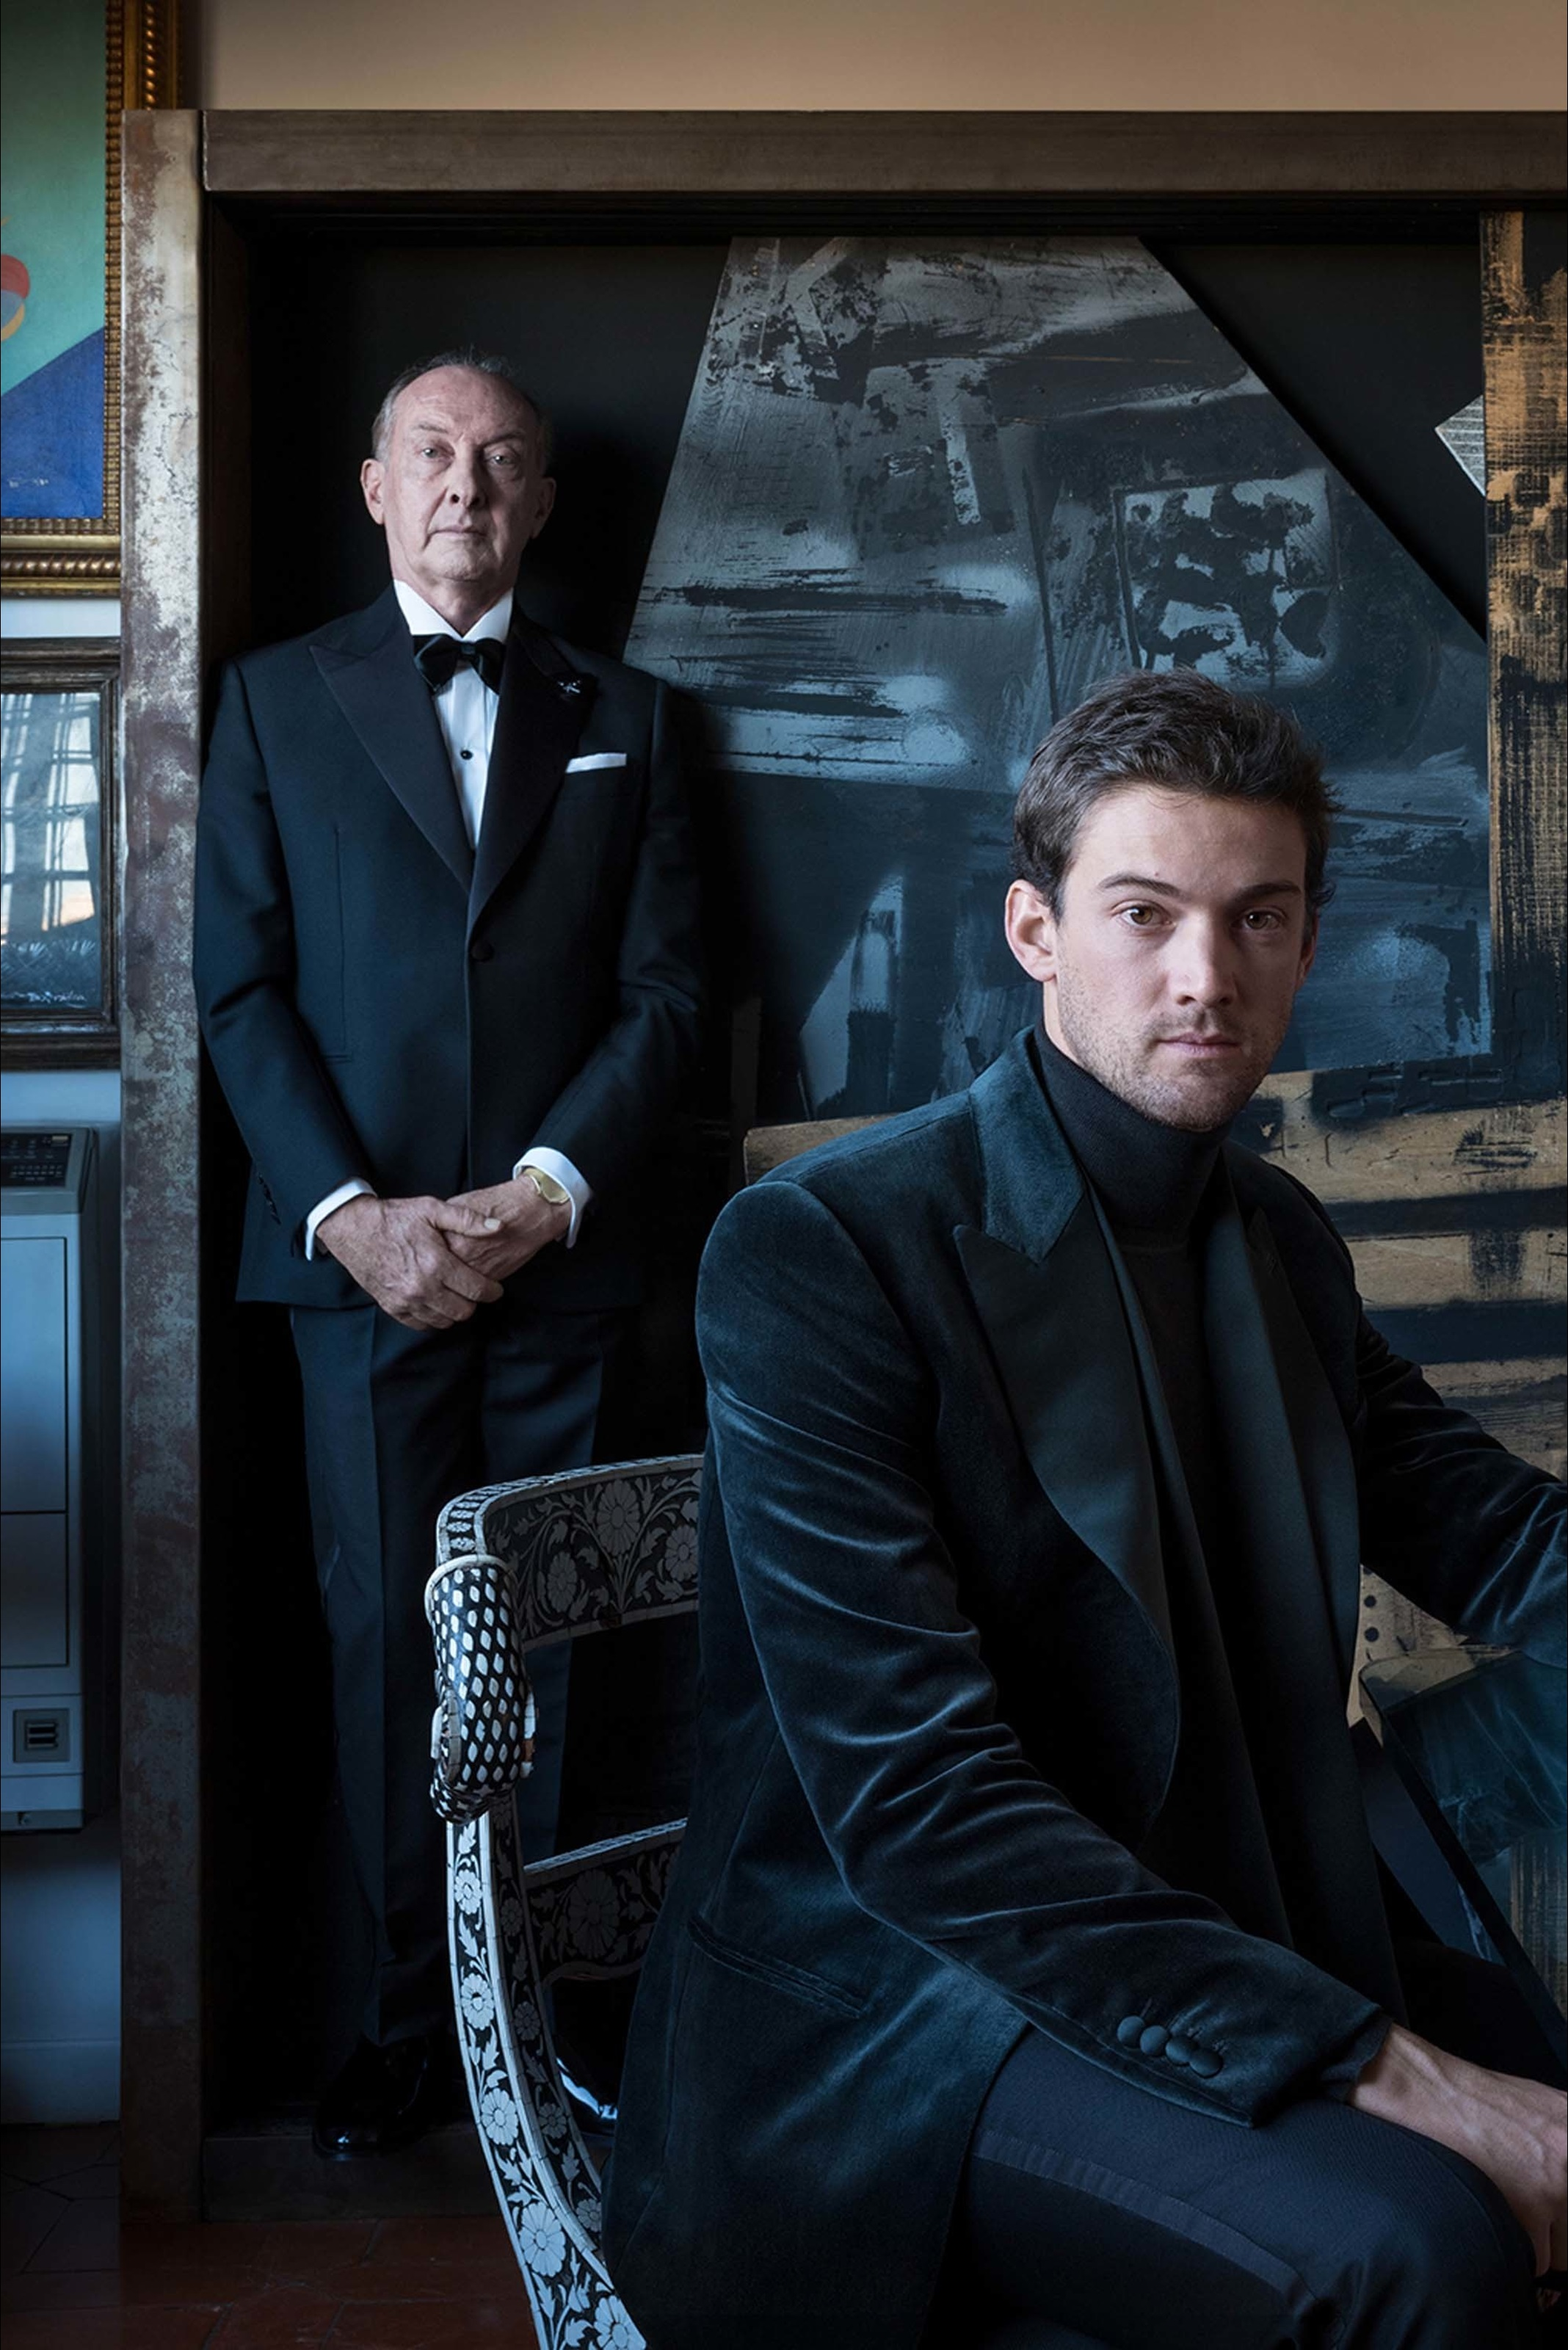 Vogue/L'Officiel – Carlo and Wagner Eleuteri as Brioni Testimonials